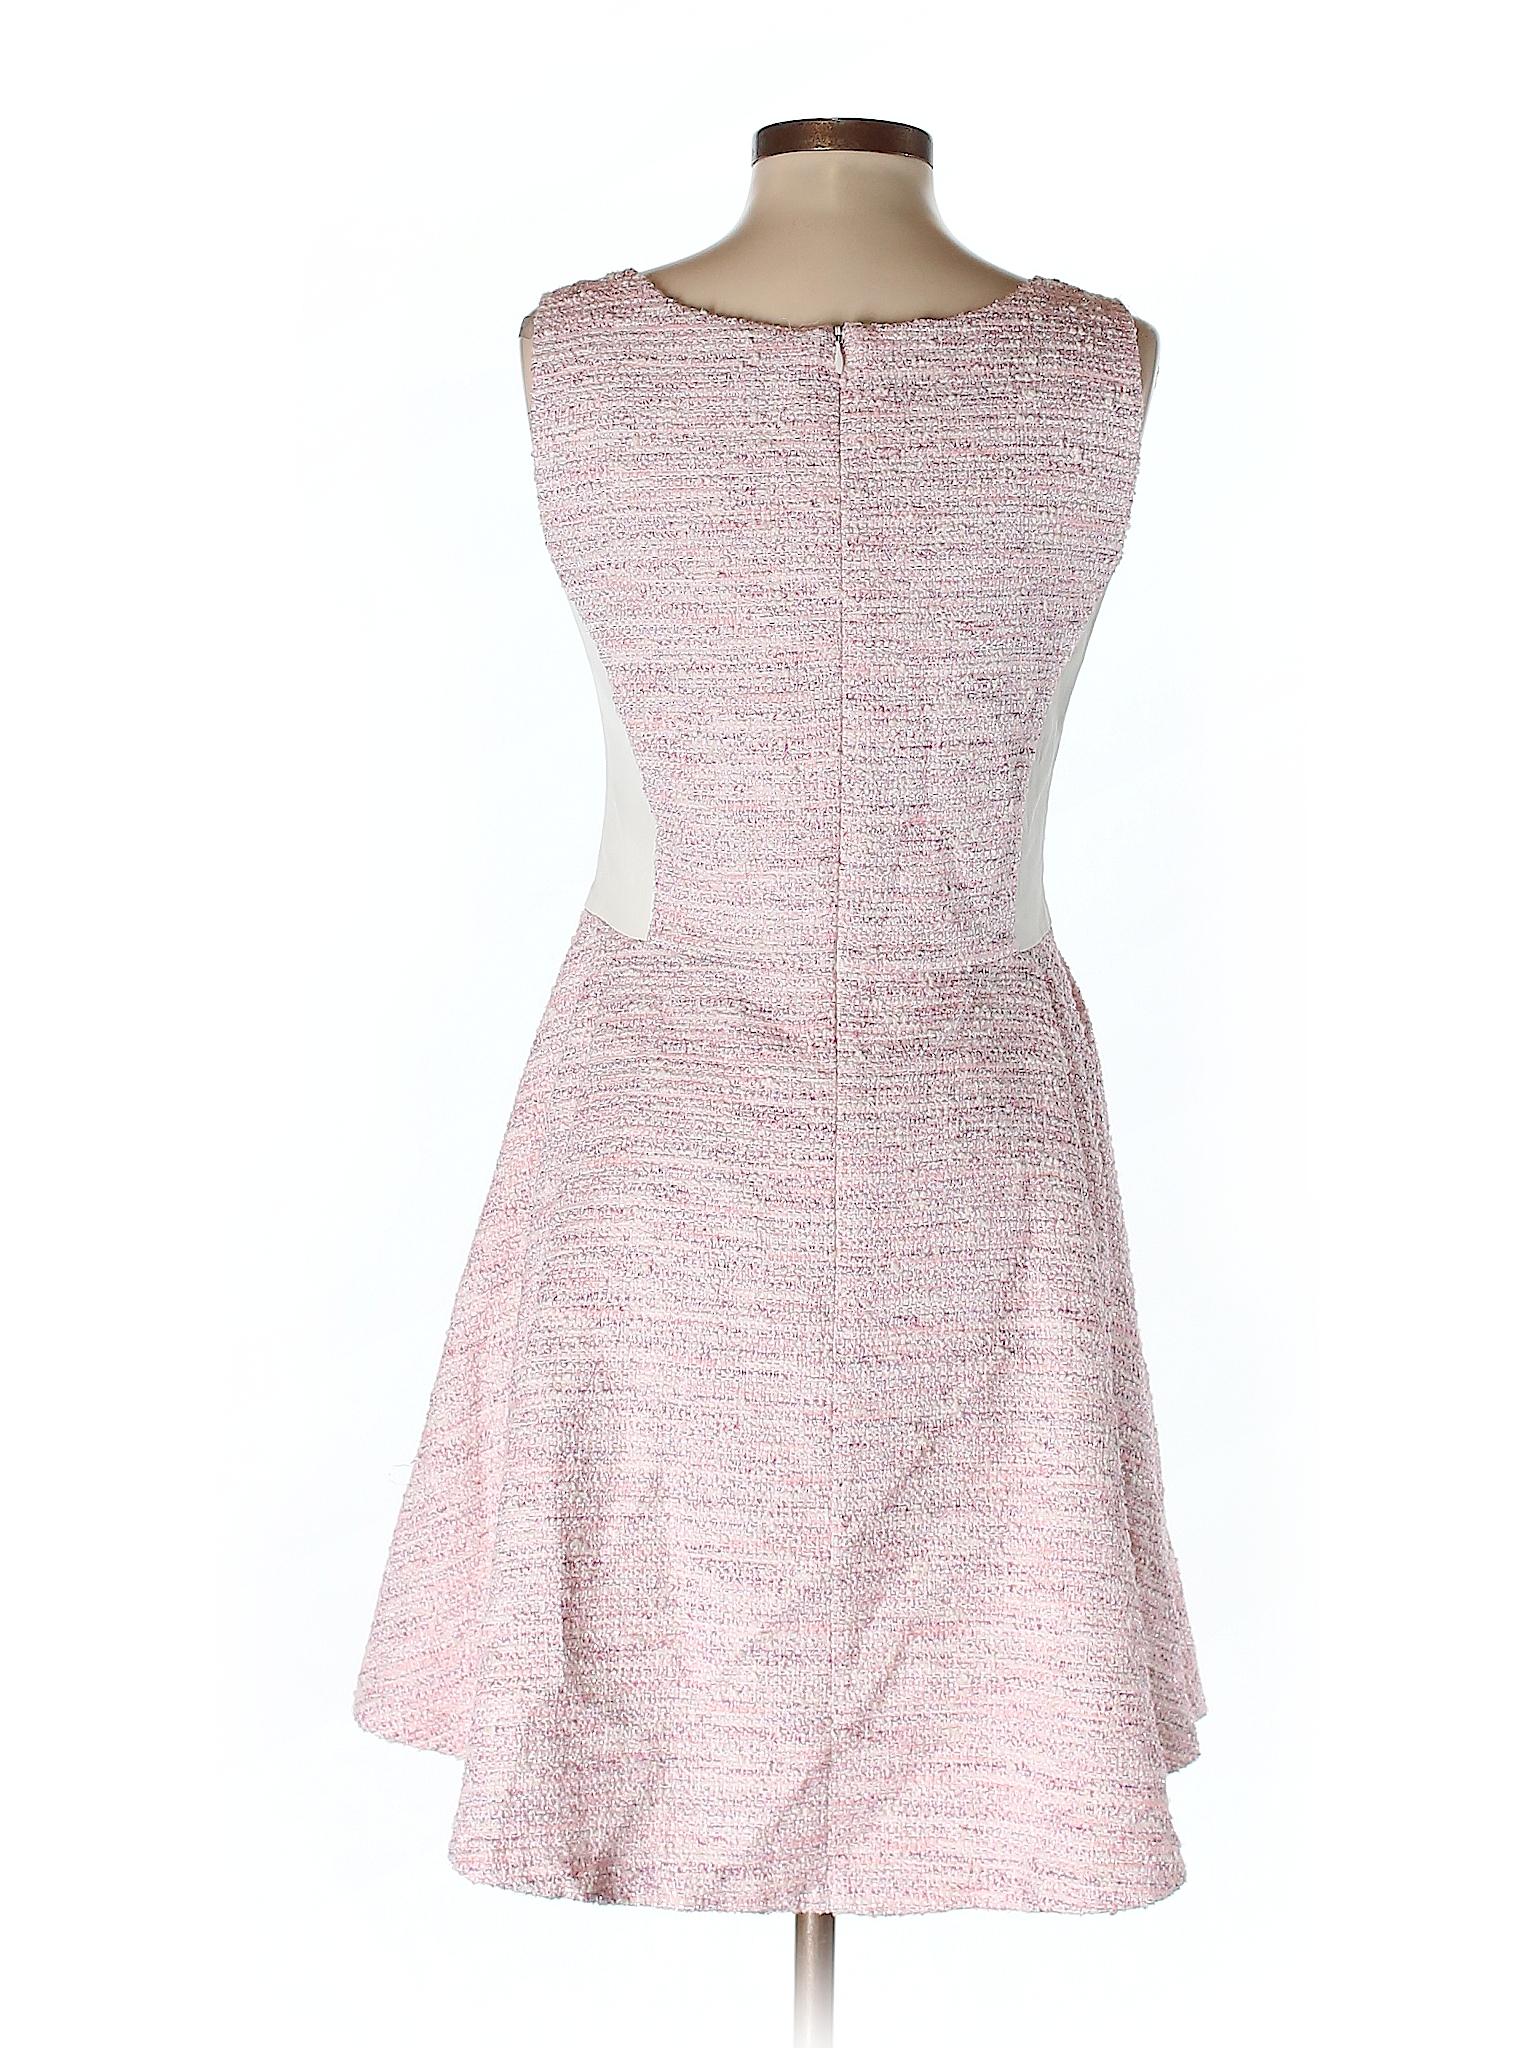 Drew Casual Drew Selling Dress Drew Selling Dress Casual Casual Dress Selling Selling Drew xC4qHvwHRn